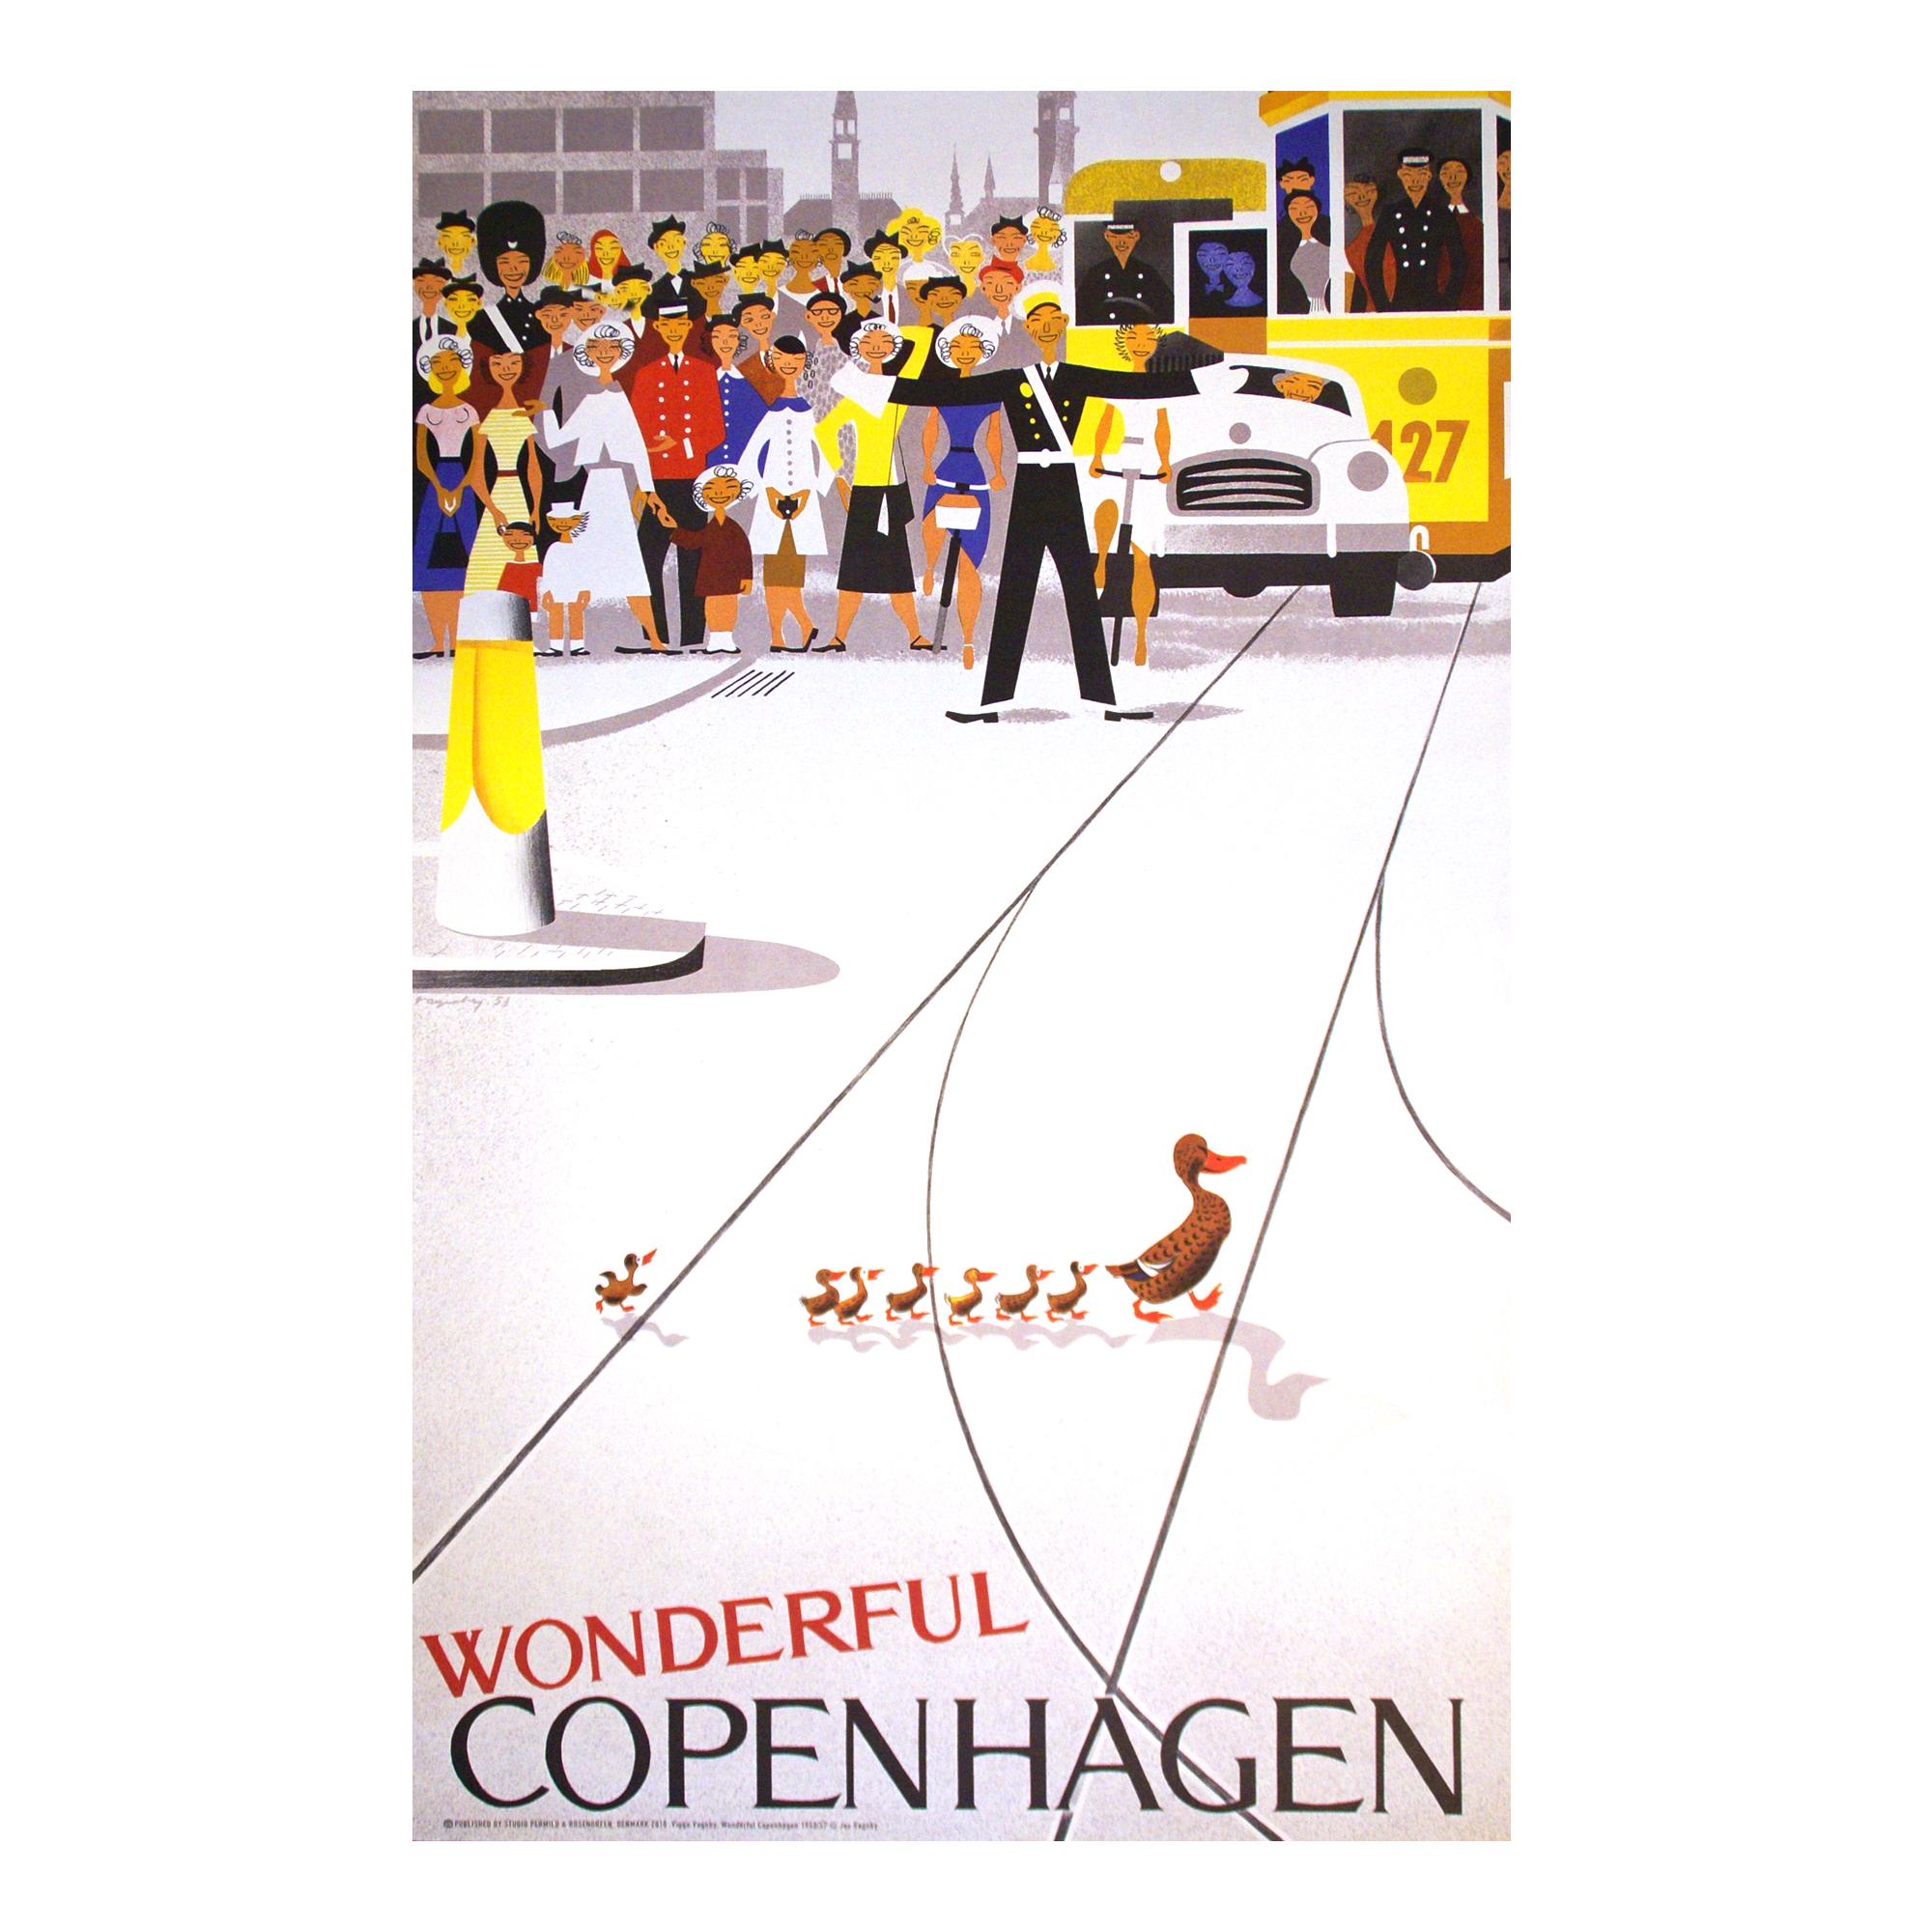 Wonderful Copenhagen poster